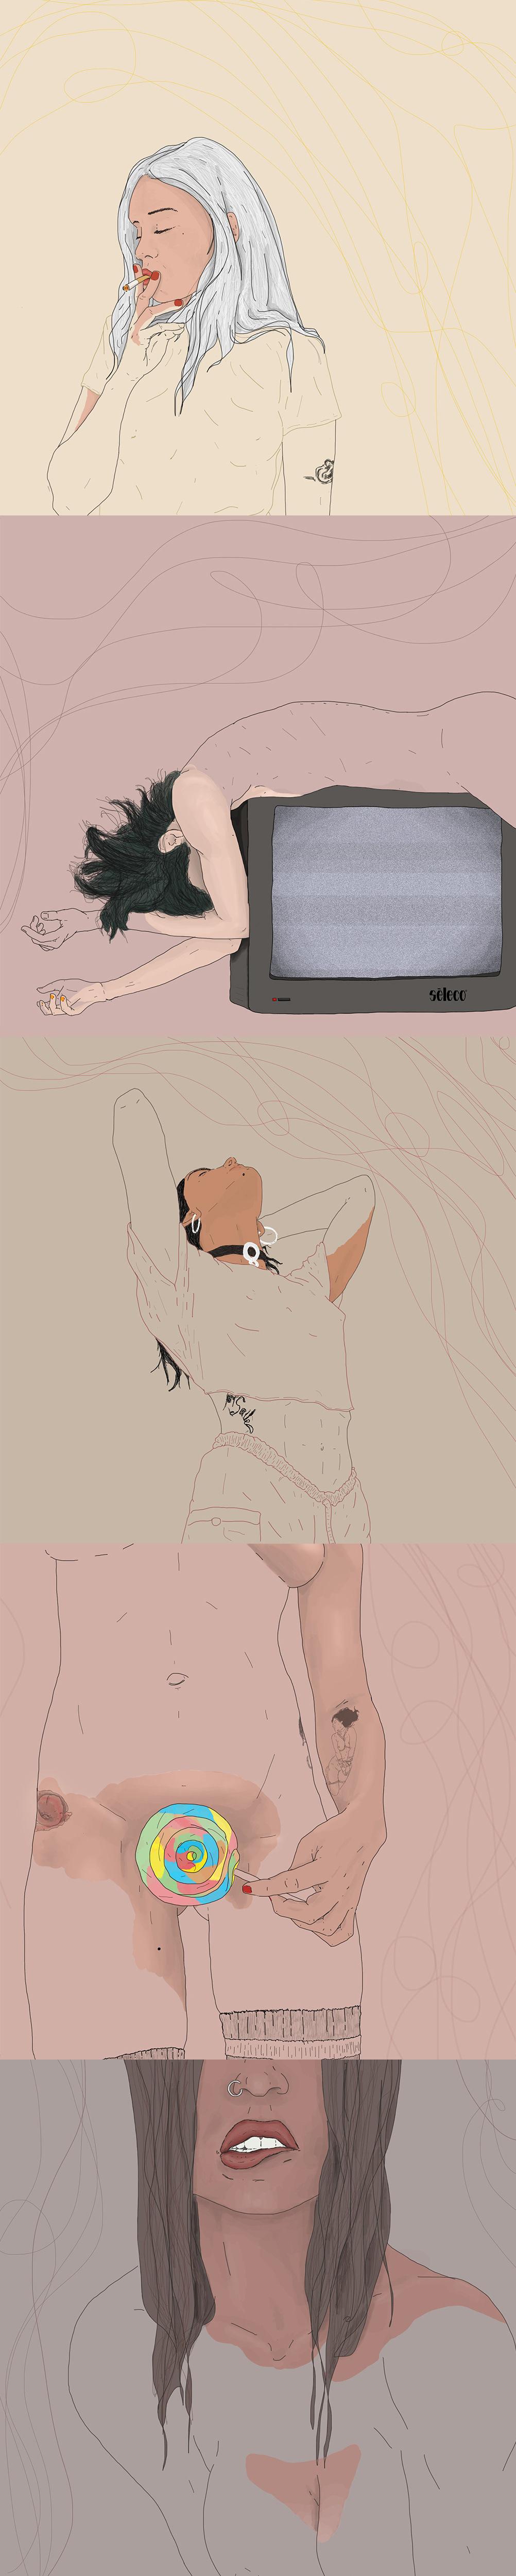 ILLUSTRATION  Drawing  woman feeling art